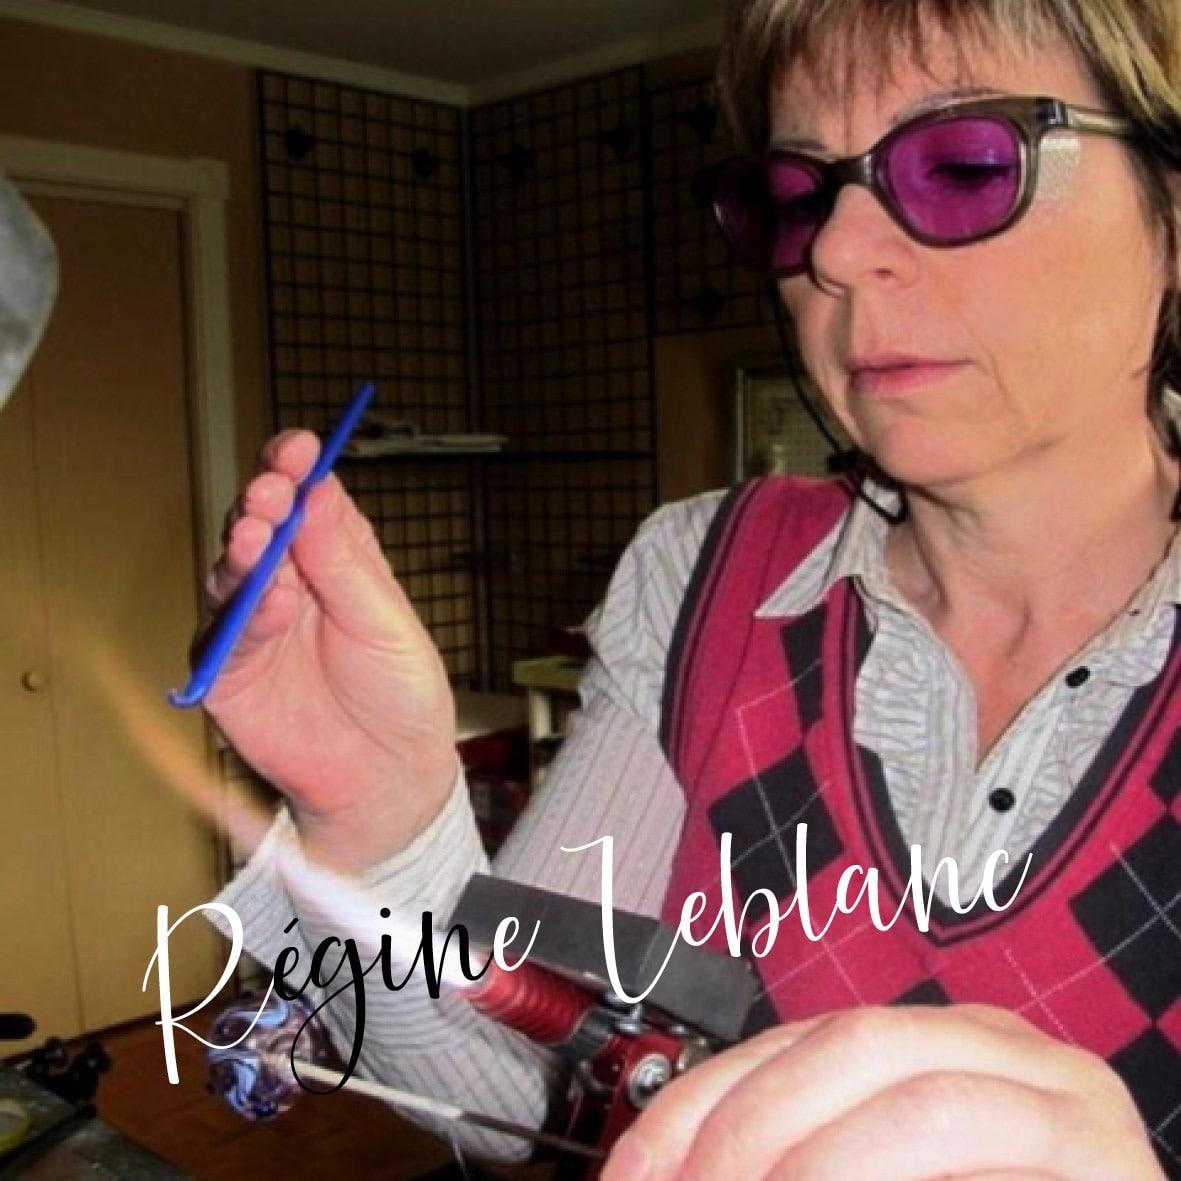 Régine Leblanc de Manu Factum